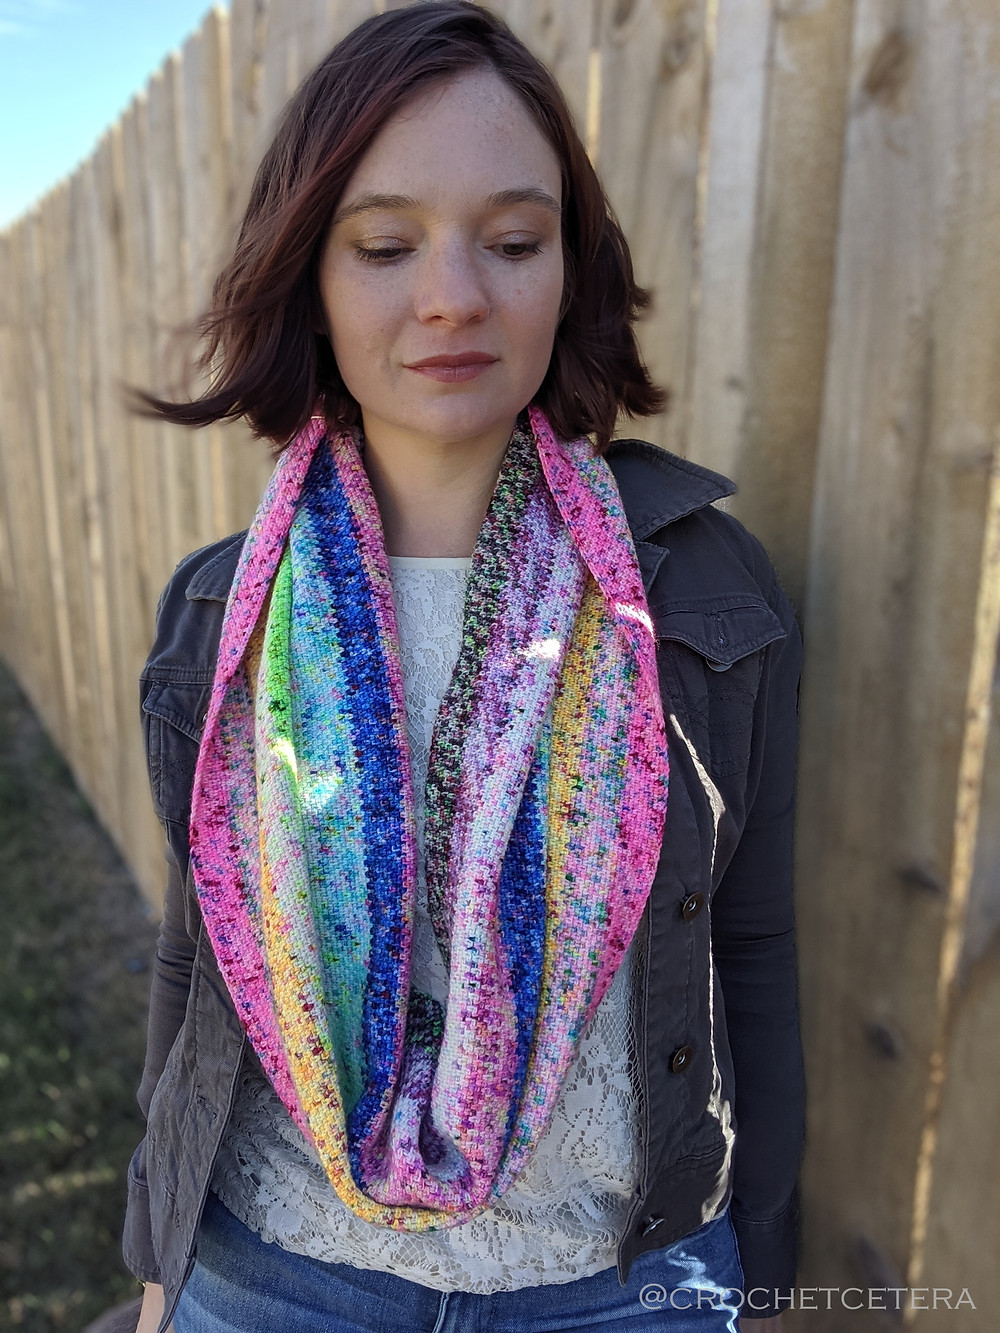 Specklewerk Cowl, Free Crochet Pattern by CrochEt Cetera by Connie Lee